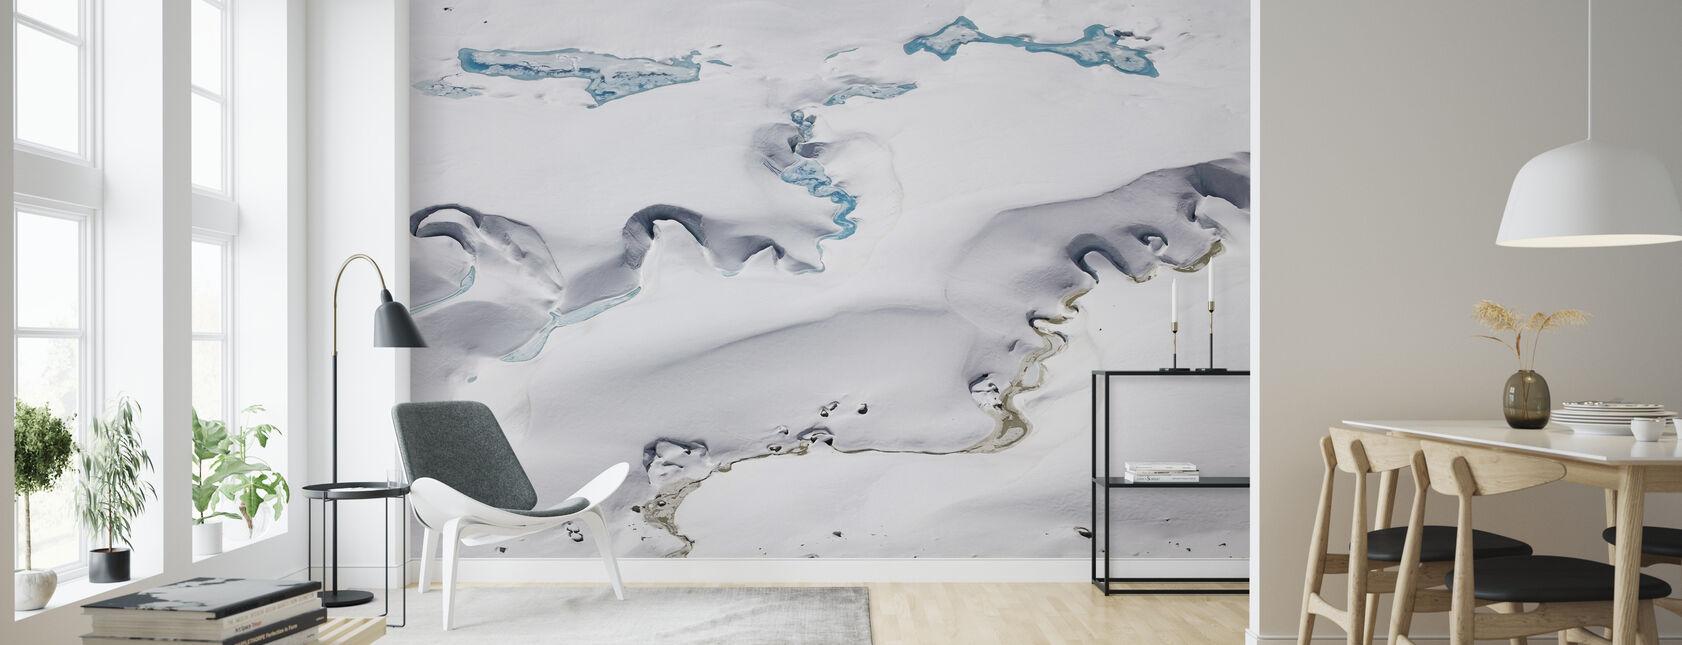 Gorner-gletsjer met smeltwaterkanalen - Behang - Woonkamer